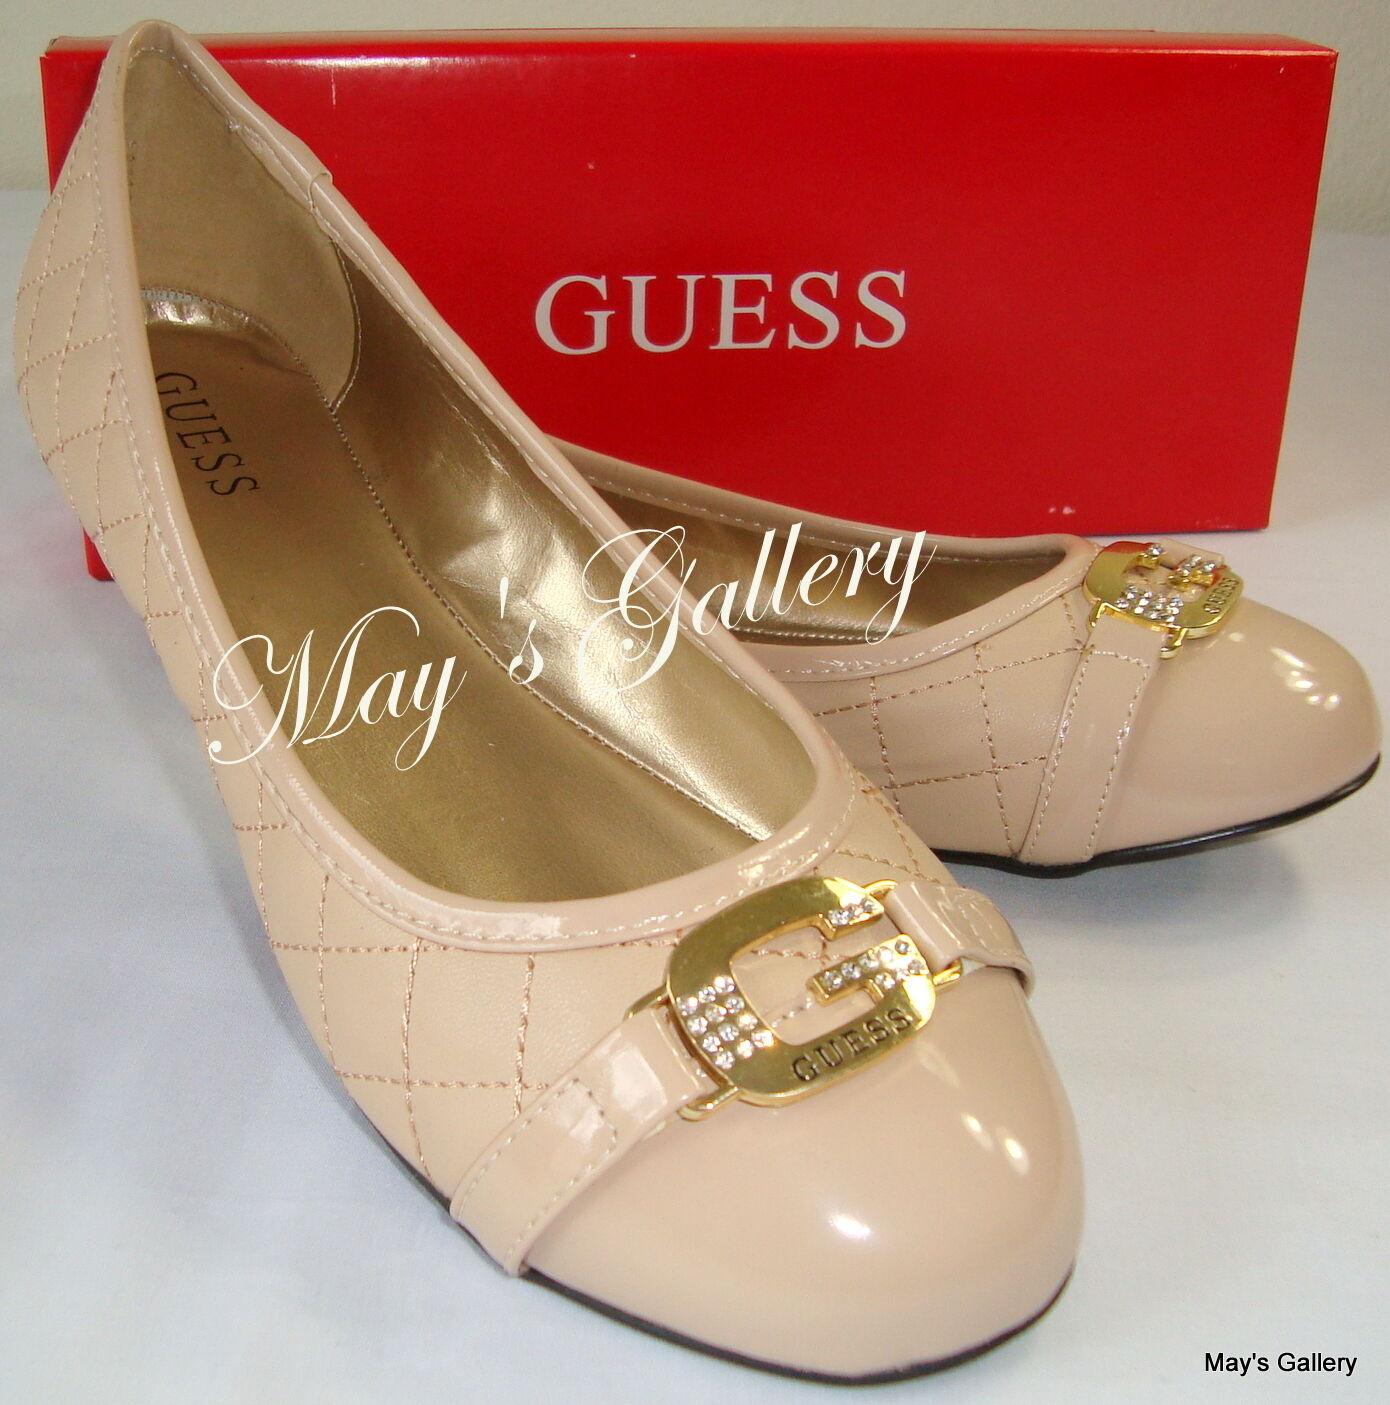 Tasas jeans zapatos zapatos zapatos planos apartado tira dedo sandalias flop ballet nuevo en Box 9  bienvenido a orden